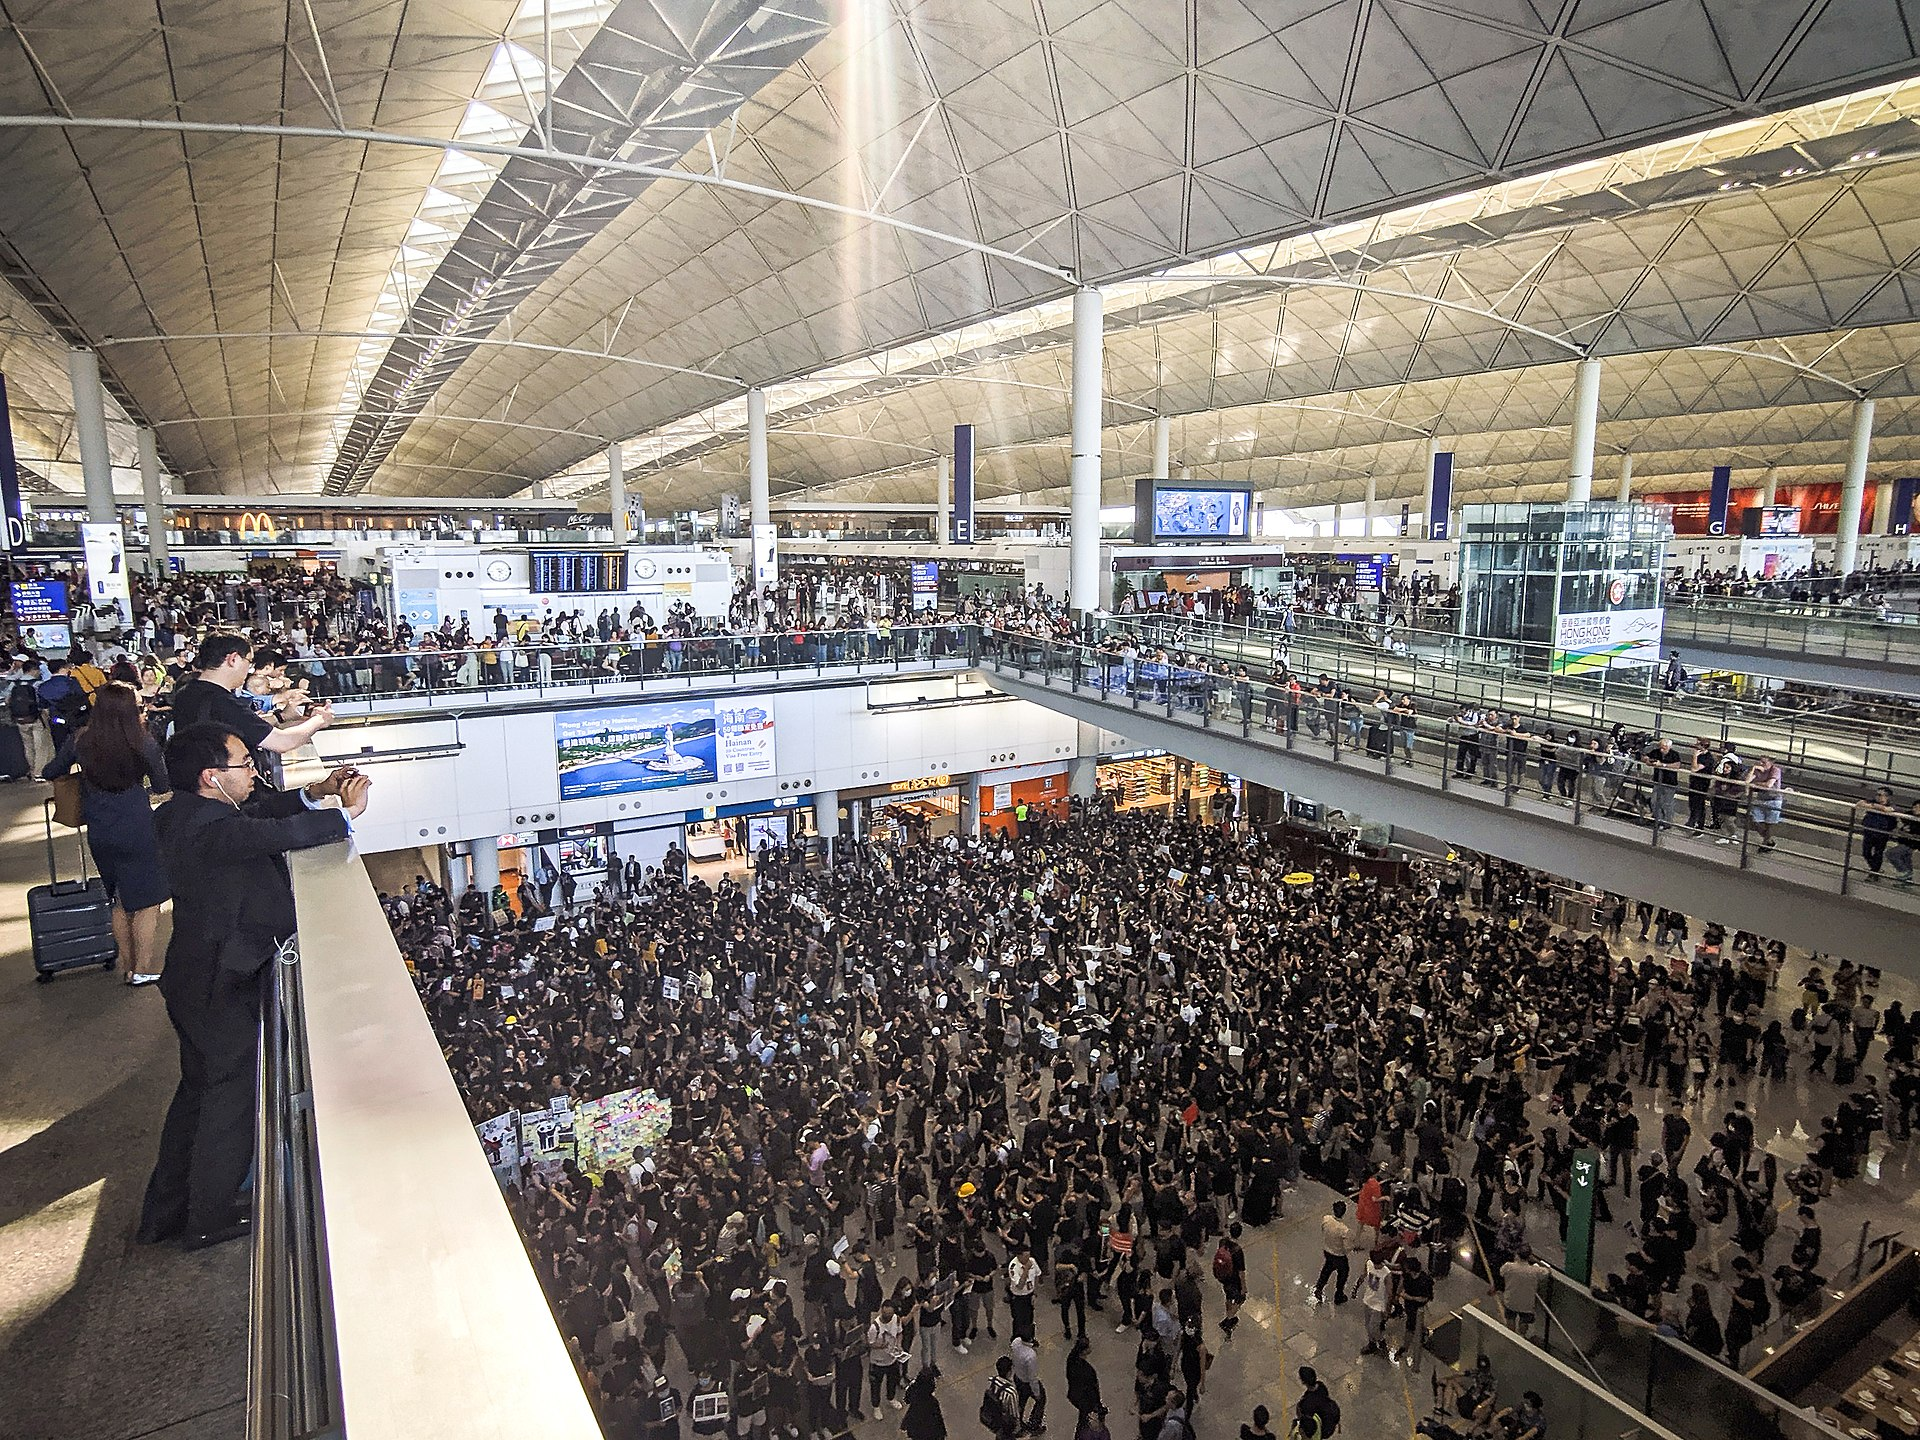 Protest at the Hong Kong International Airport on 26 July 2019